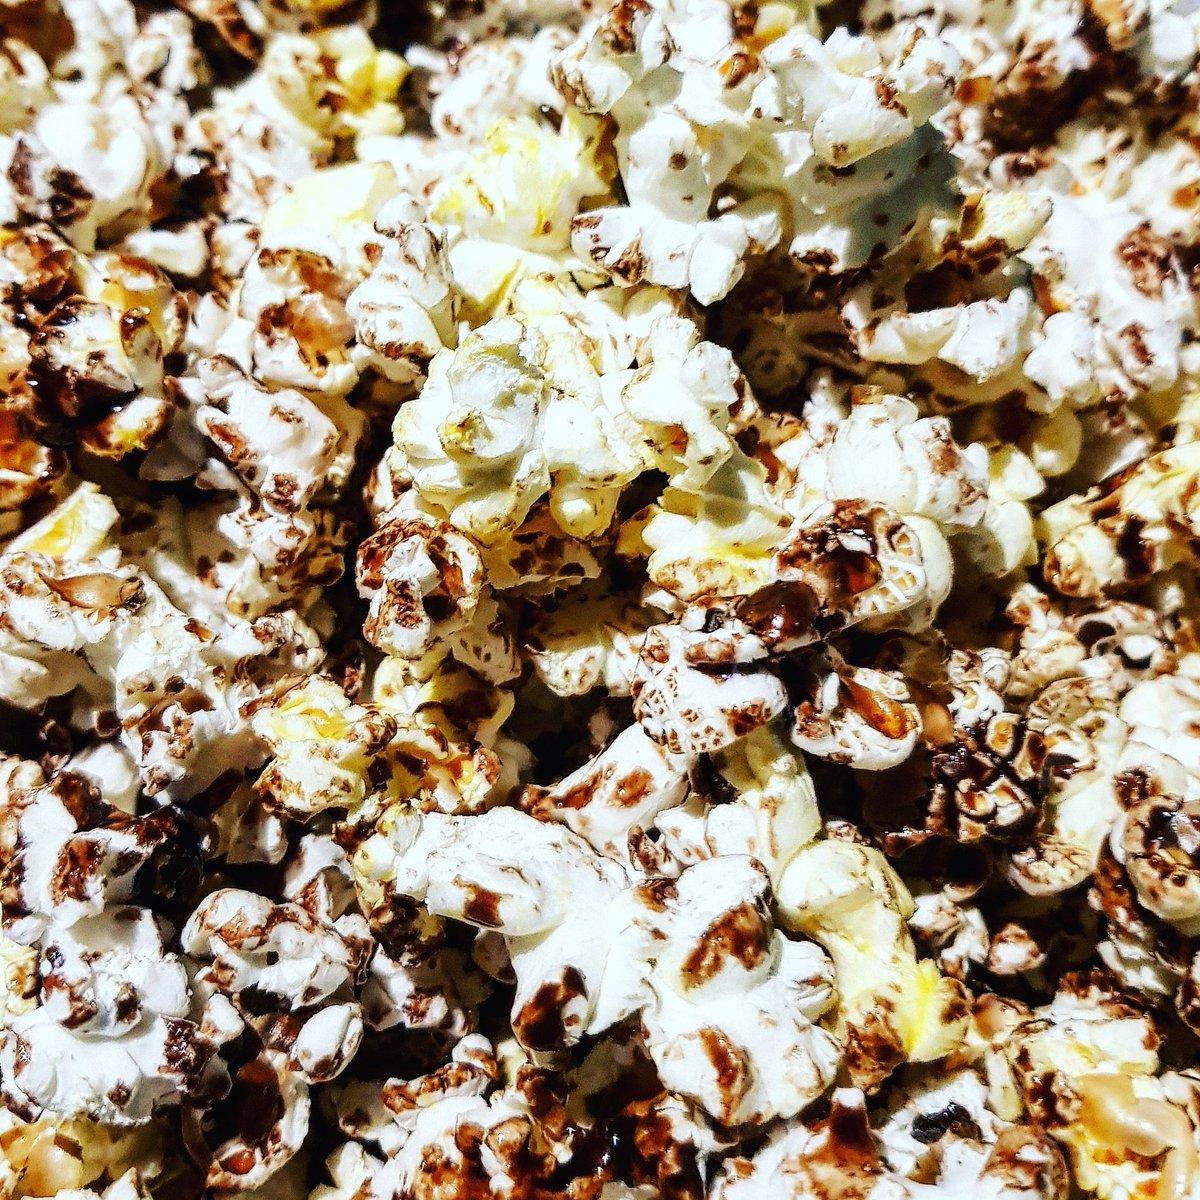 🍿 Chocolate Popcorn 🍿 #Greek #Chef #Fusion #Experiment #Chocolate #Nutrition #Healthy #Balance #Foodie #Yummers #Fresh #ActorsLife #SingersLife #WriterDaze #AussieLad #MelbourneBoy #SelfCare #ComfortFood #Organic #Healthy #FollowMe #Chef #Spring #Flavour #Popcorn #SaturdayNight https://t.co/lKZCuxtwaN